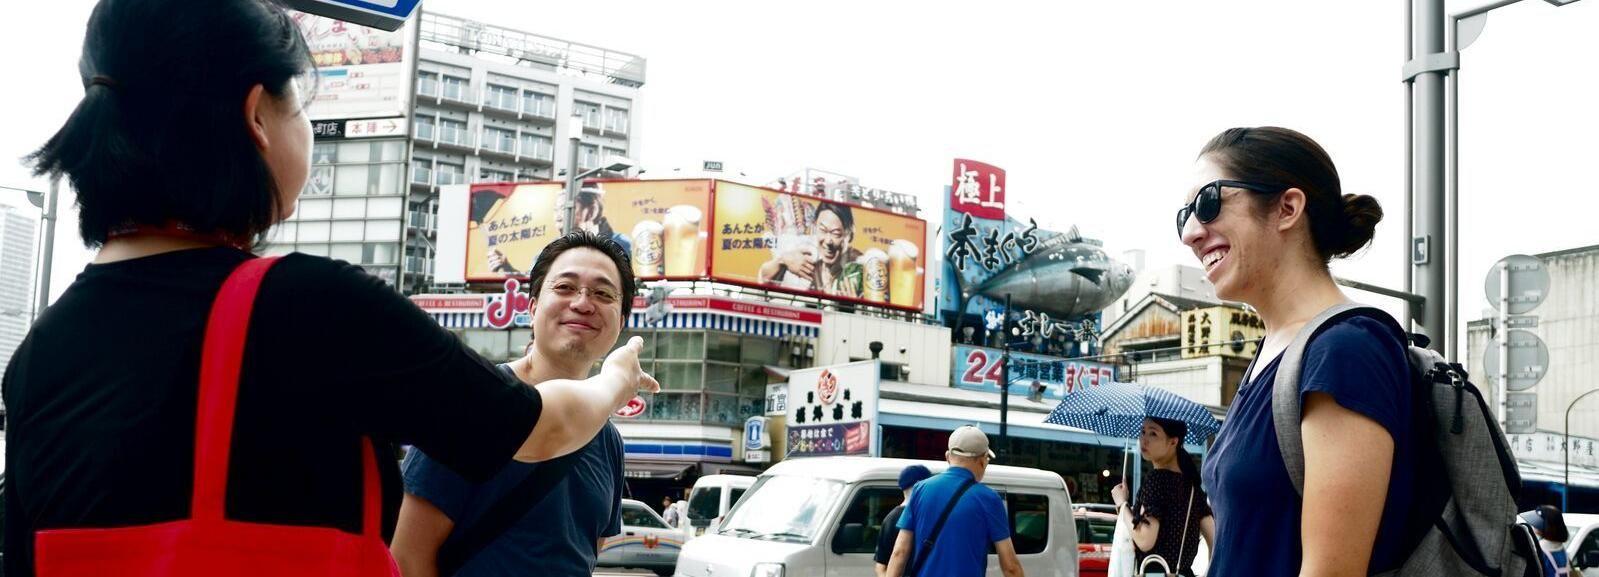 Lonely Planet Experiences: Tokyo Tsukiji Fish Market Tour